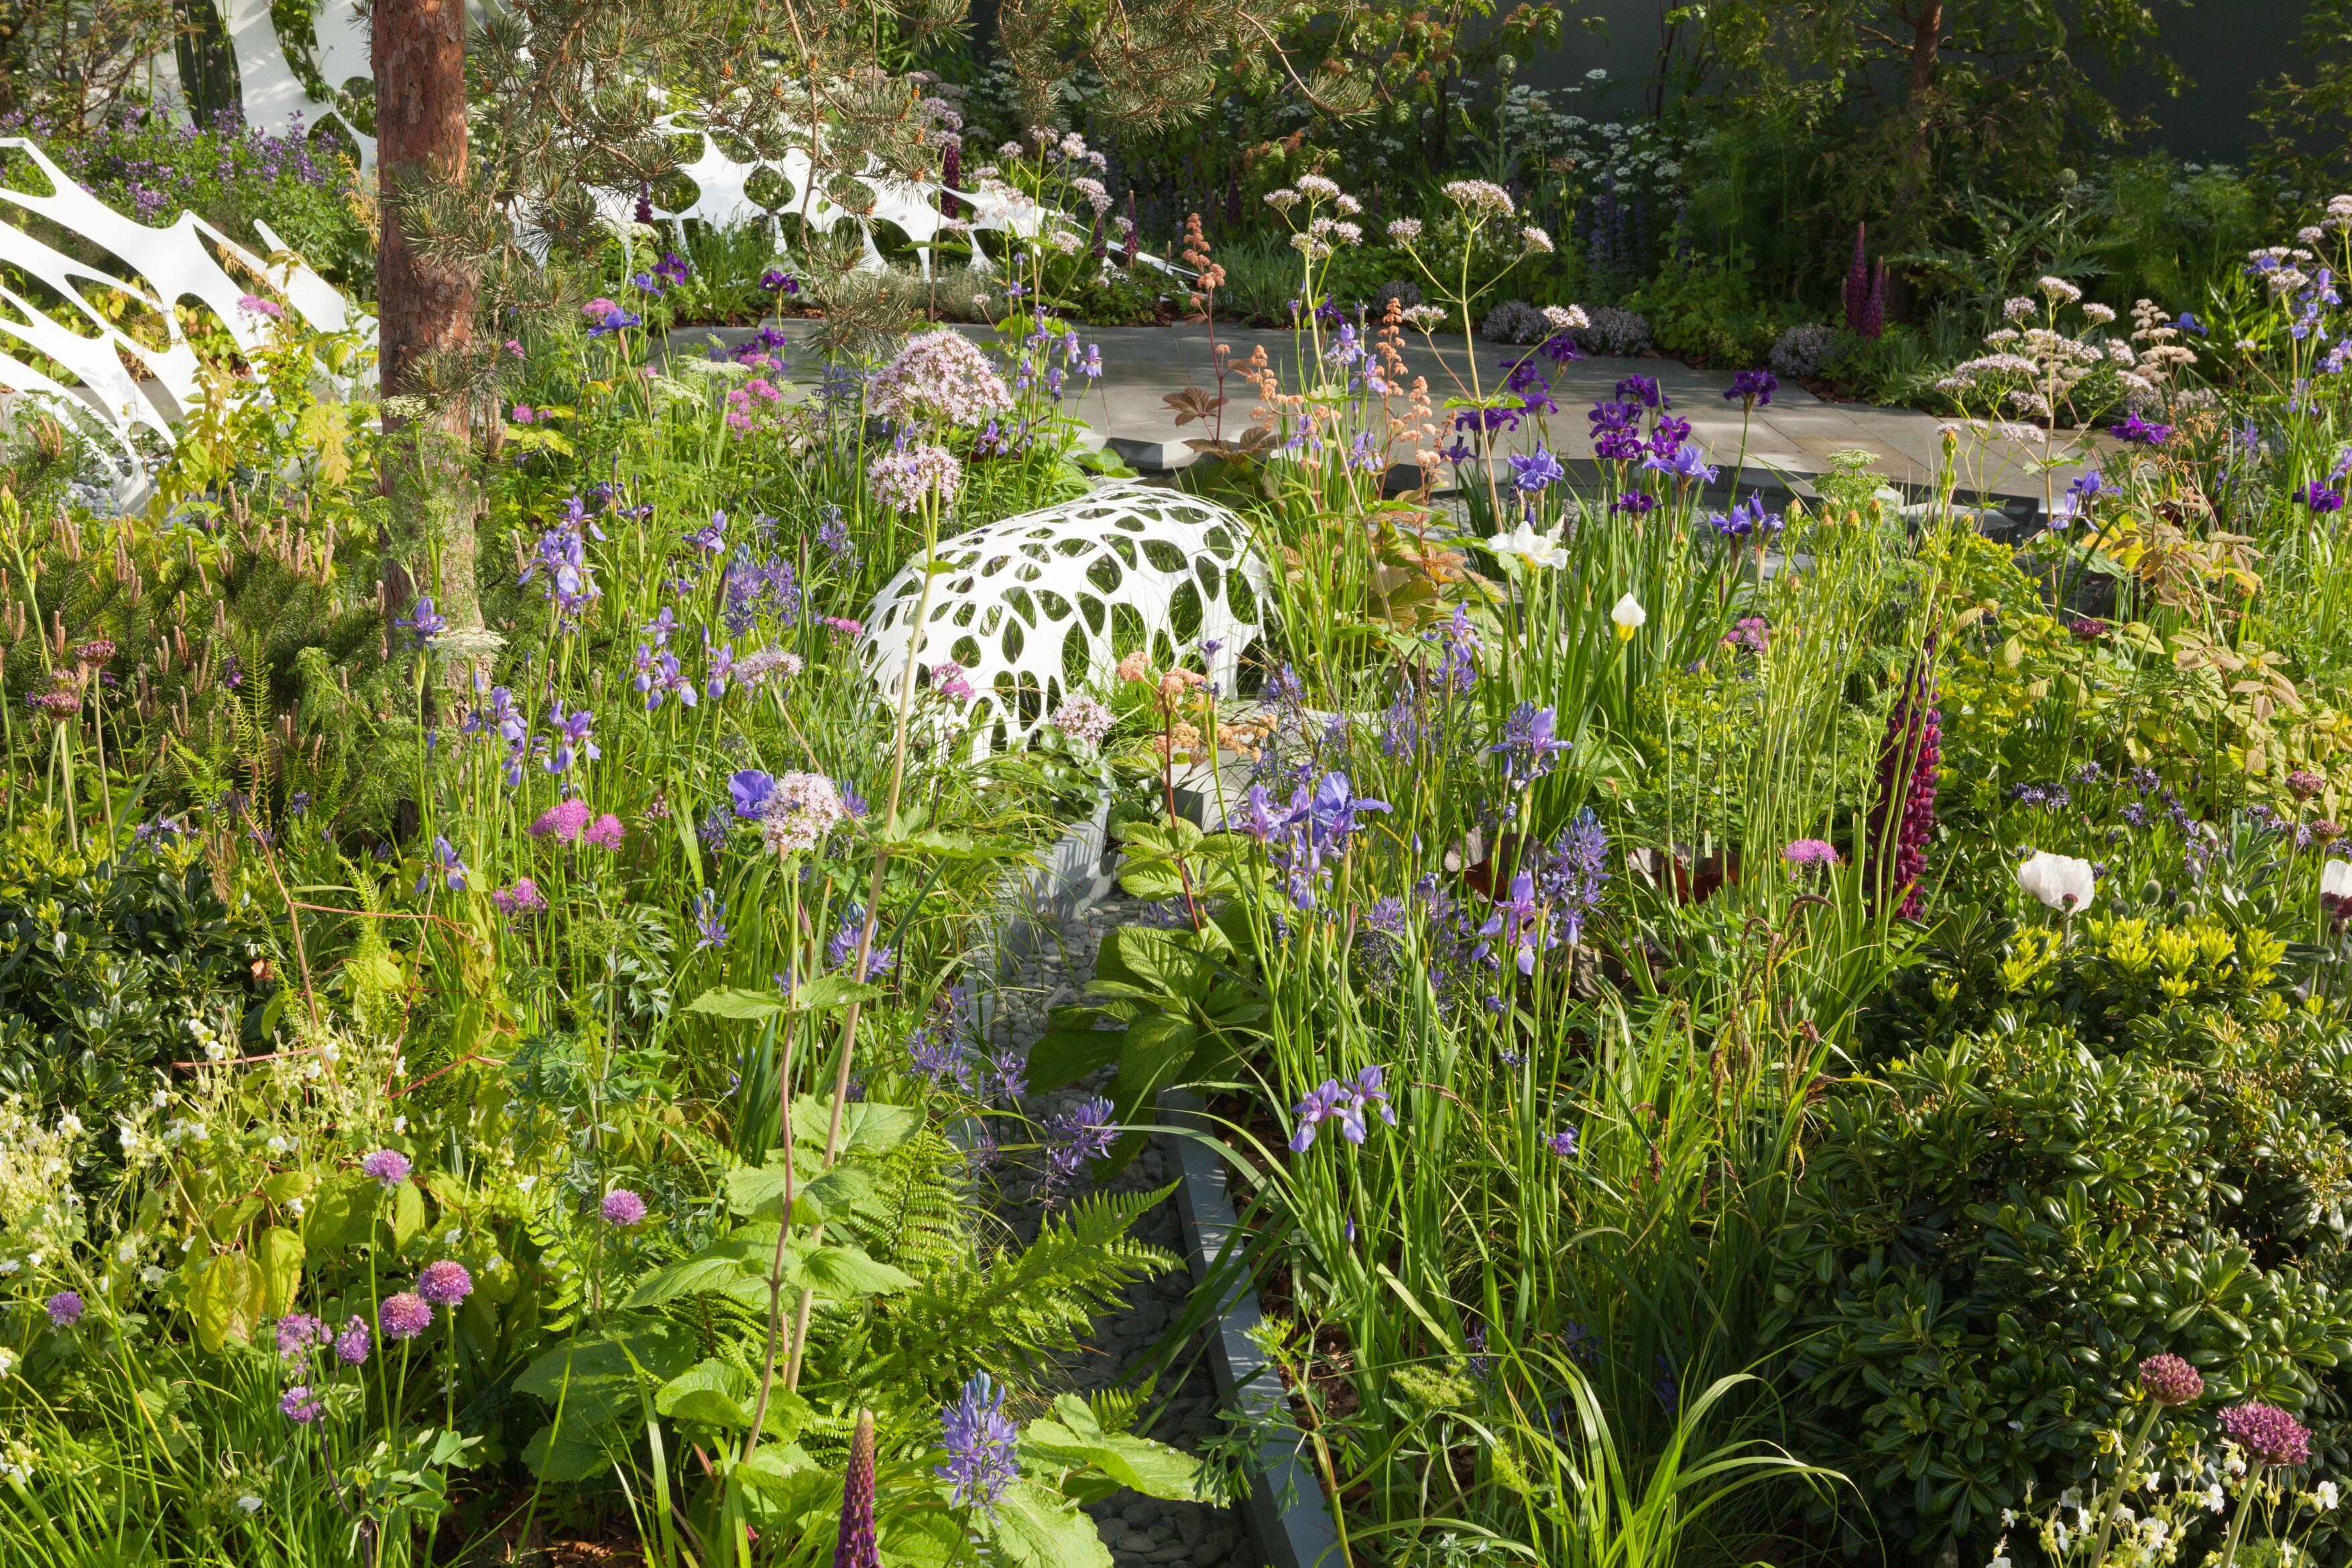 The Manchester Garden In 2020 Chelsea Flower Show Flower Show